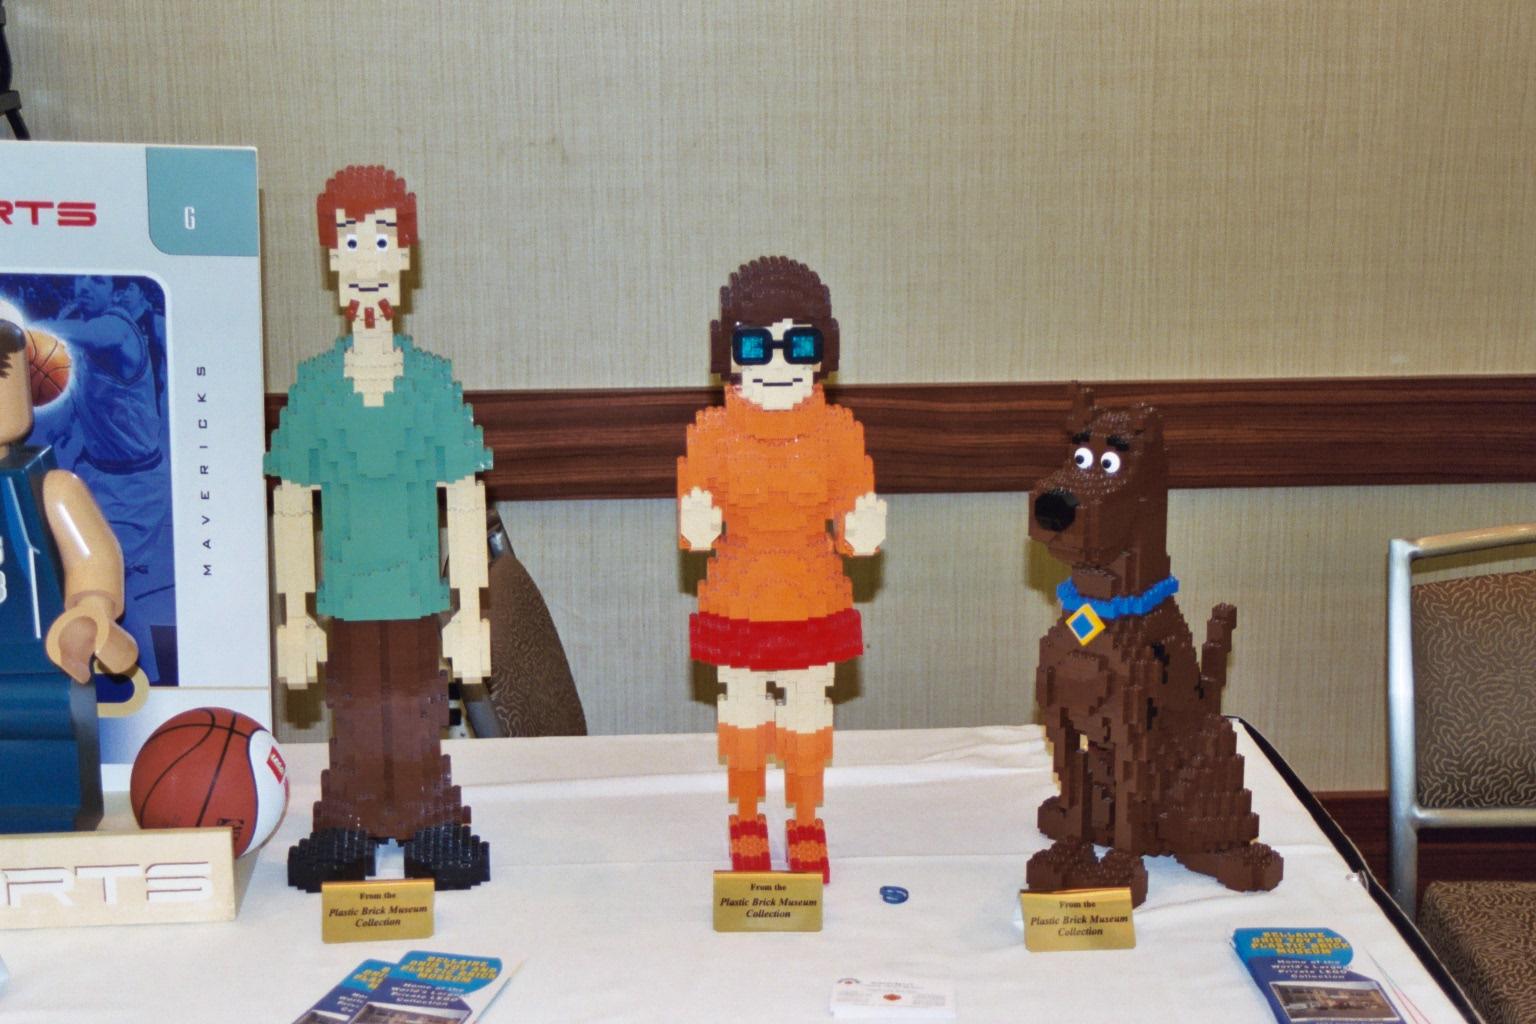 http://www.brickshelf.com/gallery/red-rocker/Brickworld-2008/217_15a.jpg